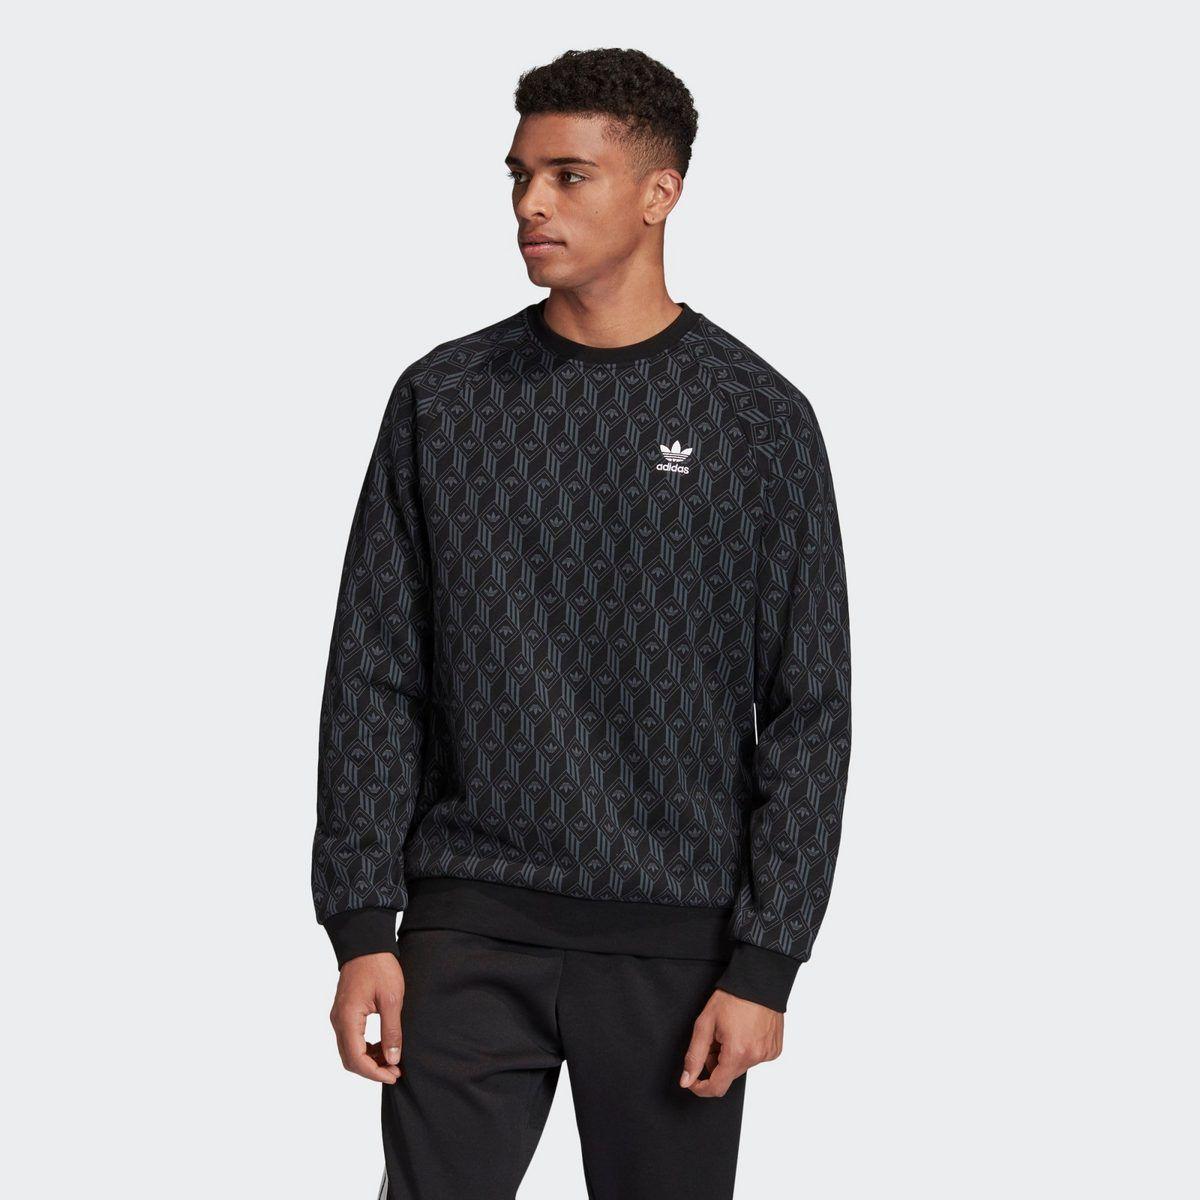 Adidas Originals Sweatshirt Allover Print Sweatshirt Graphics Online Kaufen Otto Jaqueta Adidas Blusa Adidas Adidas Preto [ 1200 x 1200 Pixel ]